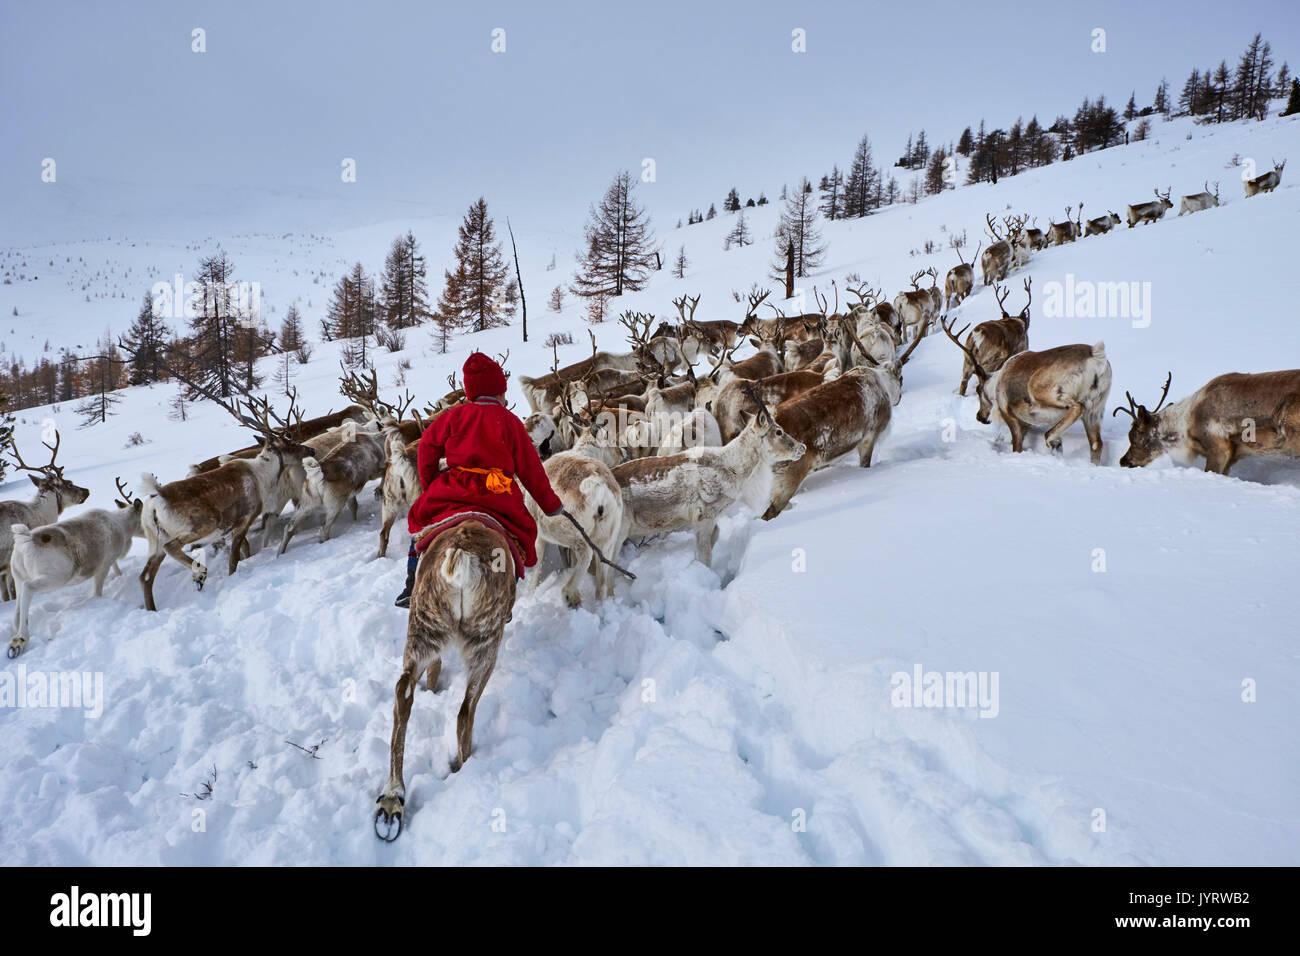 Mongolia, Khovsgol privince, the Tsaatan, reindeer herder, winter migration, transhumance - Stock Image